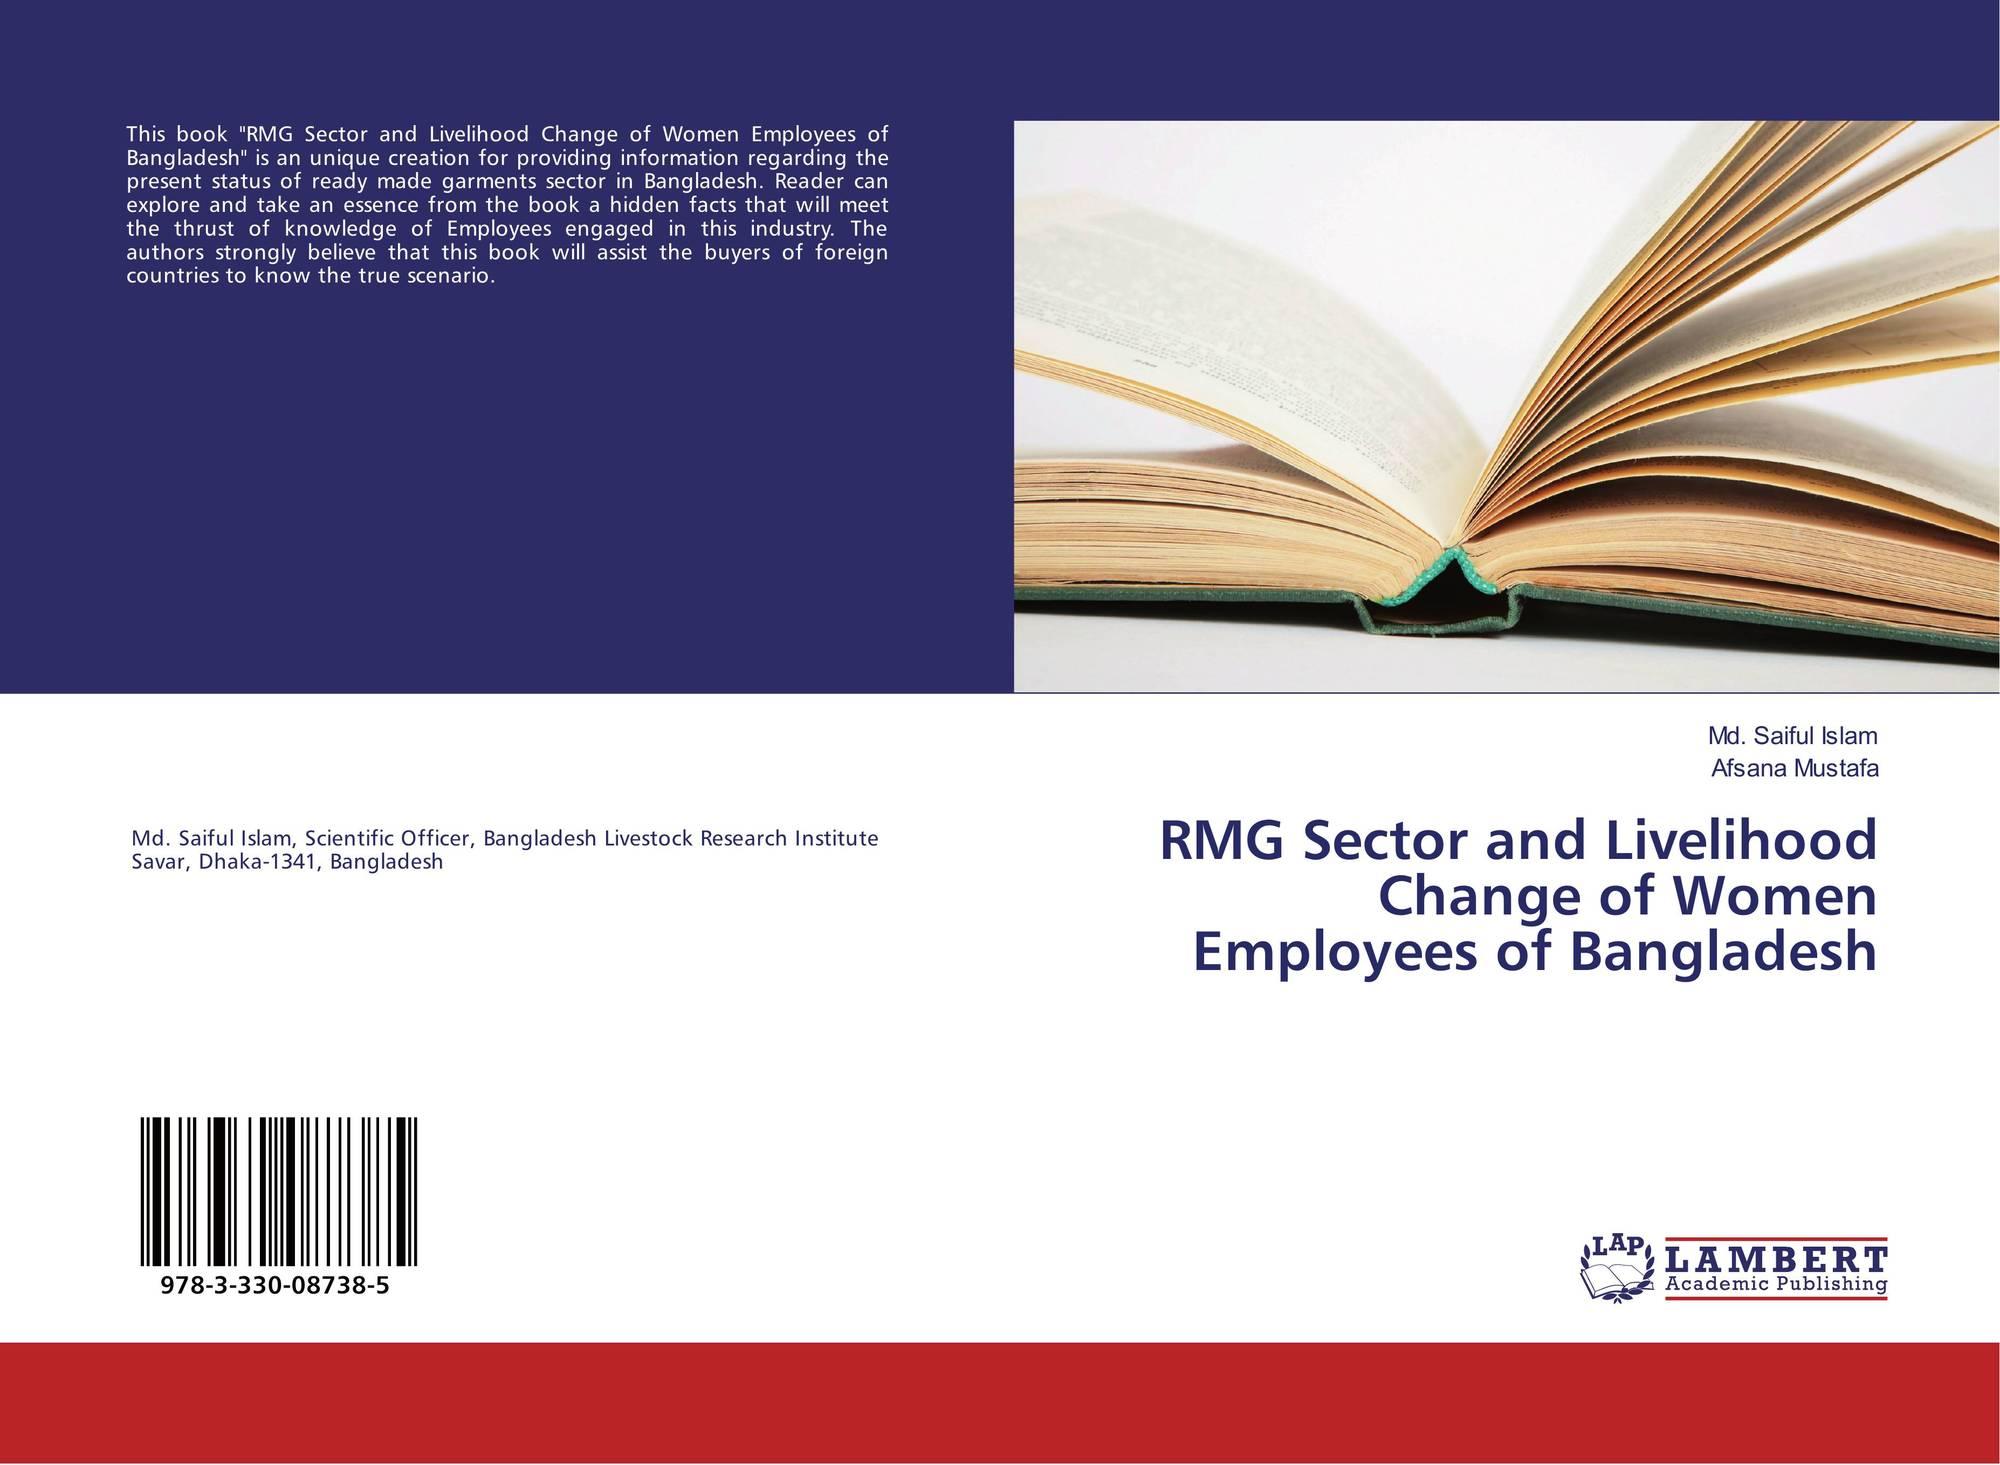 impact of rmg sector in bangladesh